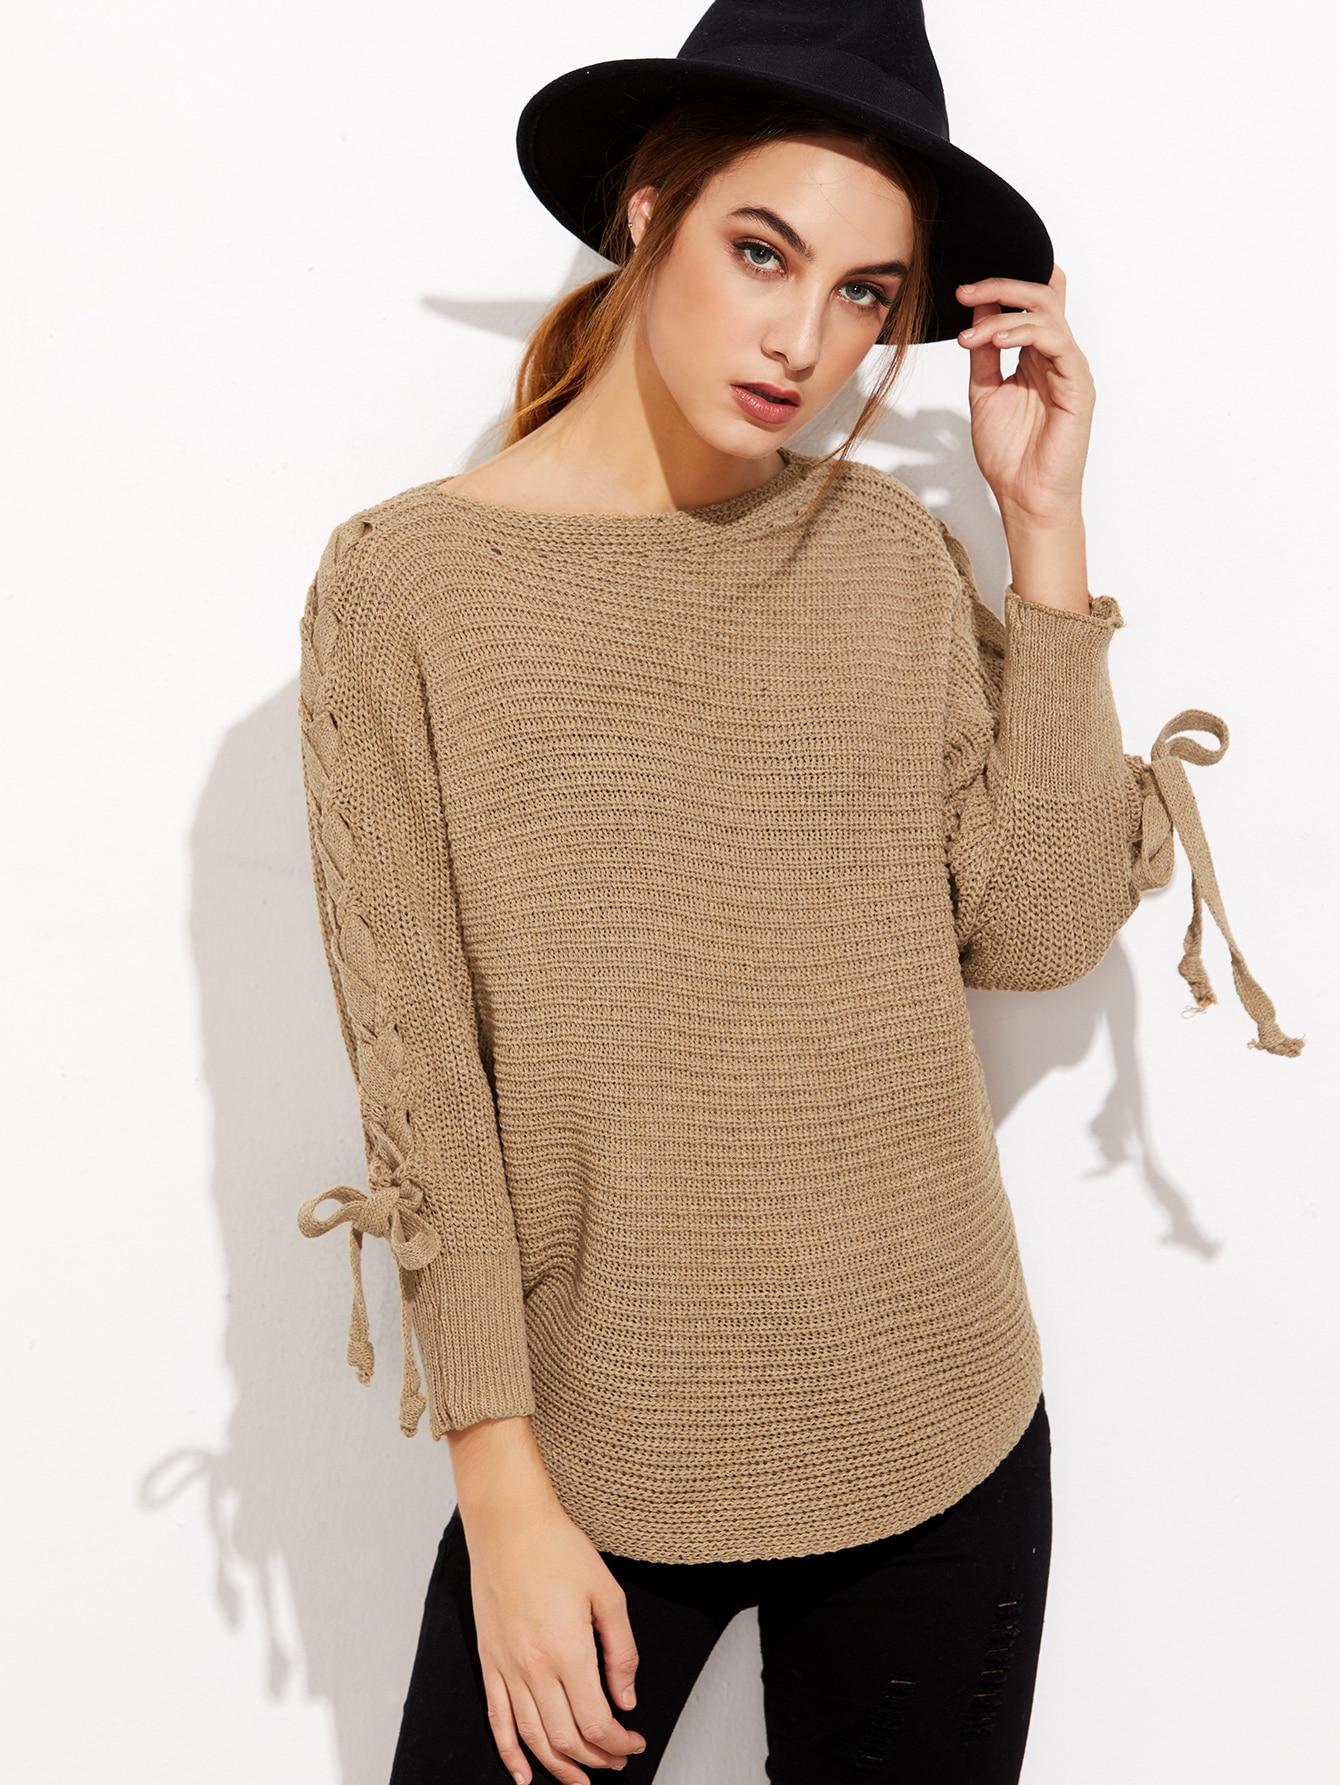 Khaki Lace Up Sleeve Curved Hem Sweater sweater161027002